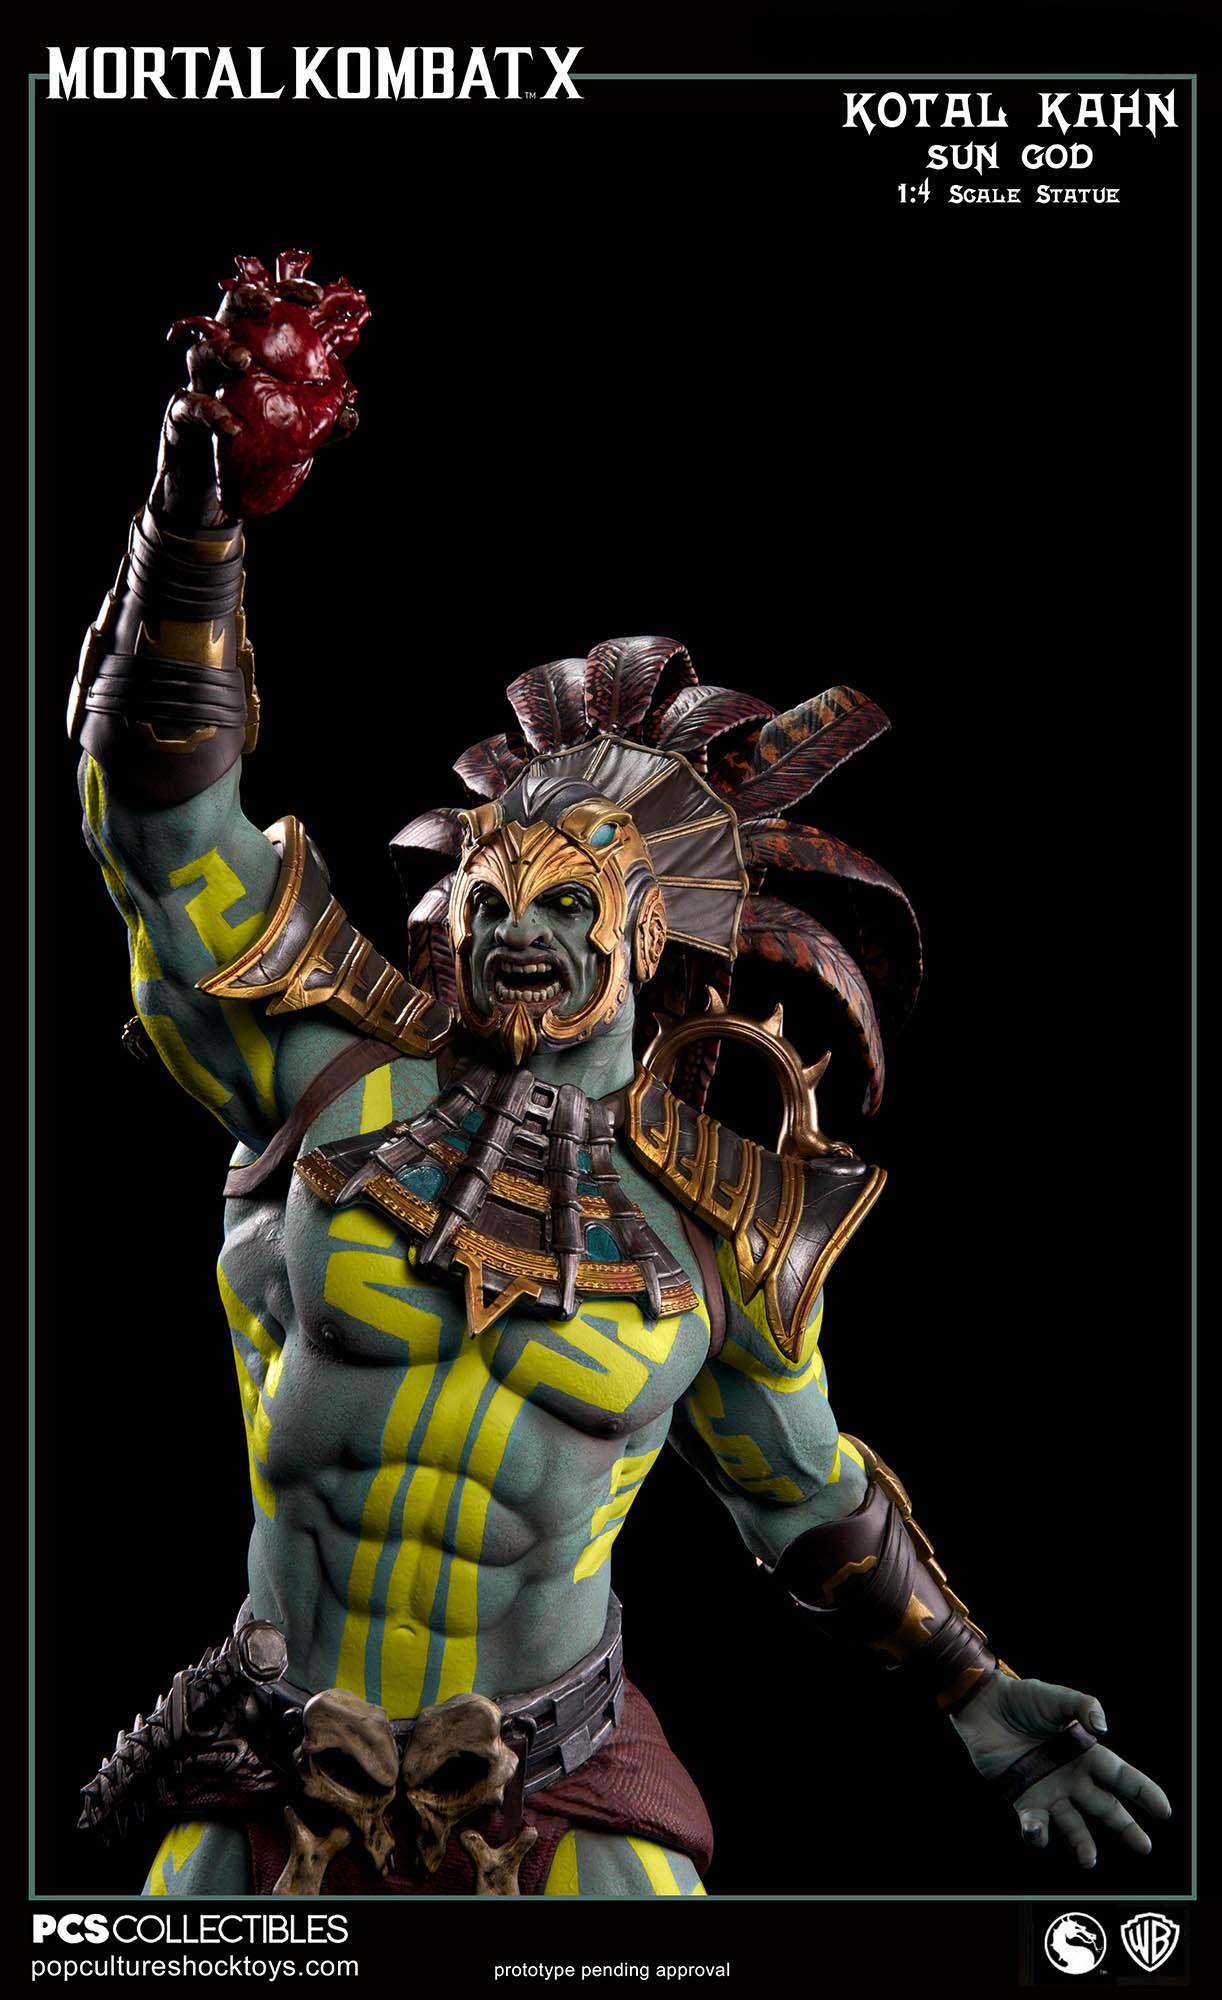 [Pop Culture Shock] Mortal Kombat X: Kotal Kahn 1:4 scale PCS-Kotal-Kahn-Sun-God-017